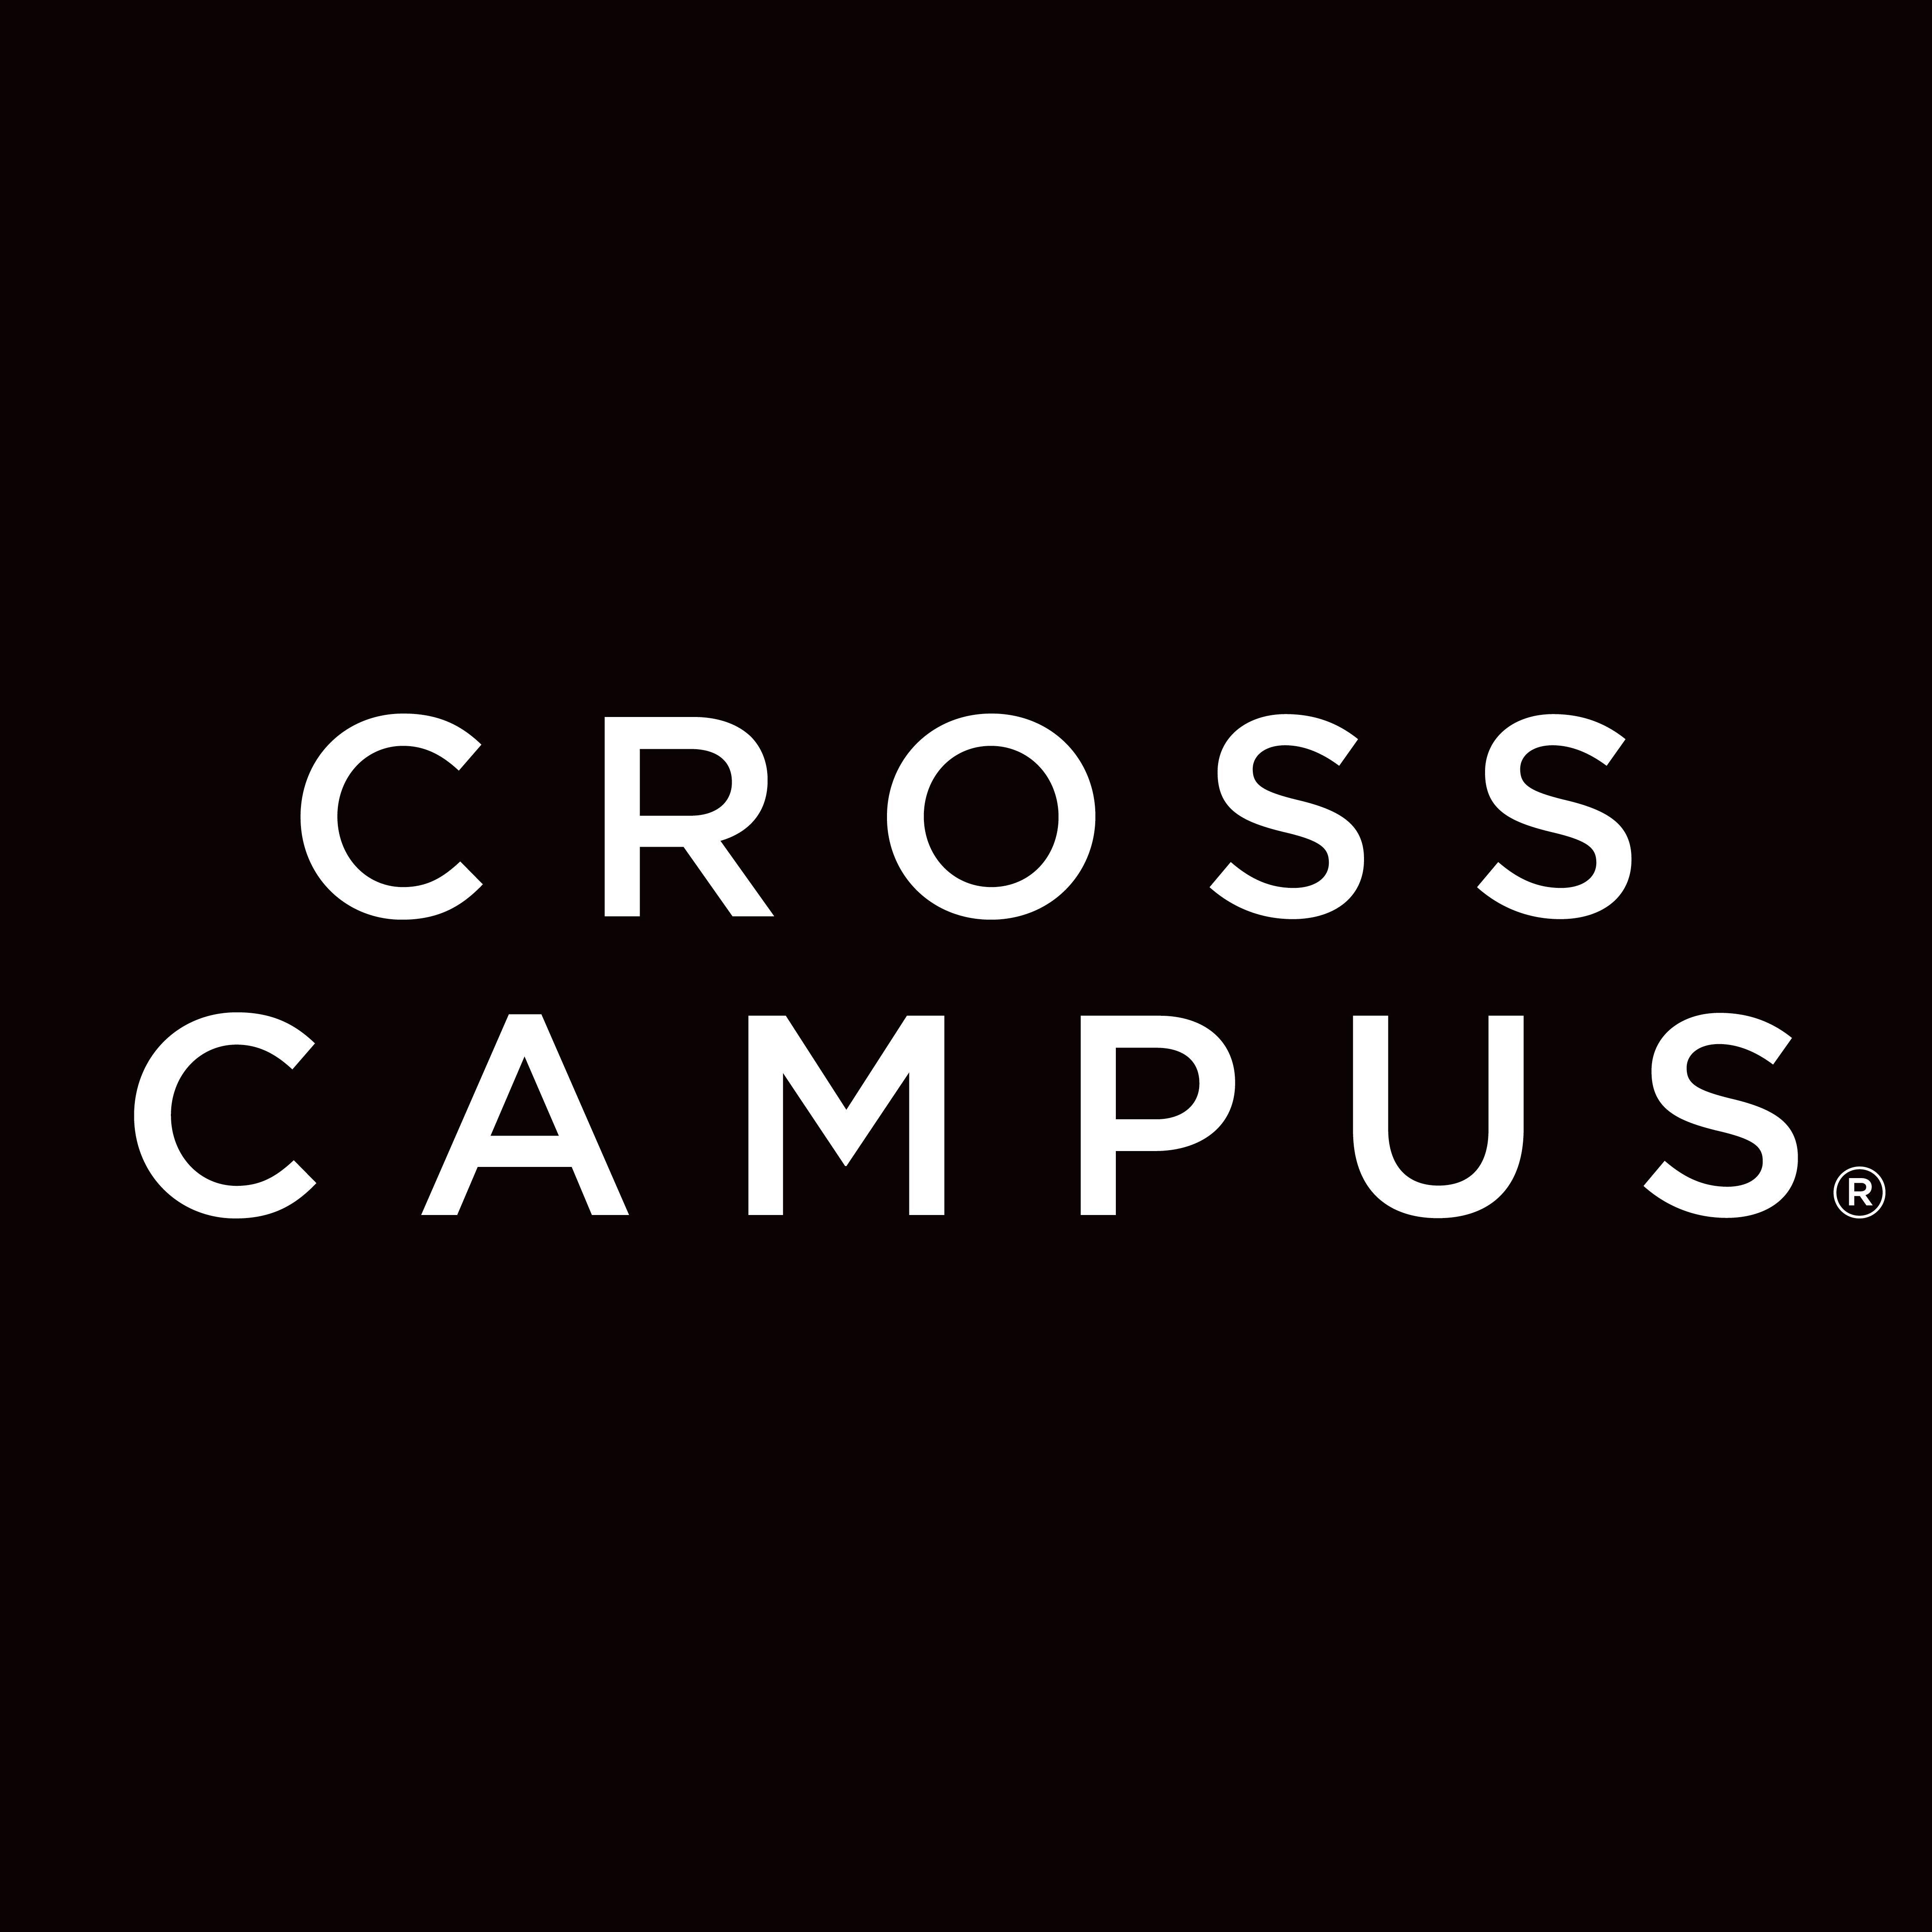 Logo of Cross Campus South Bay